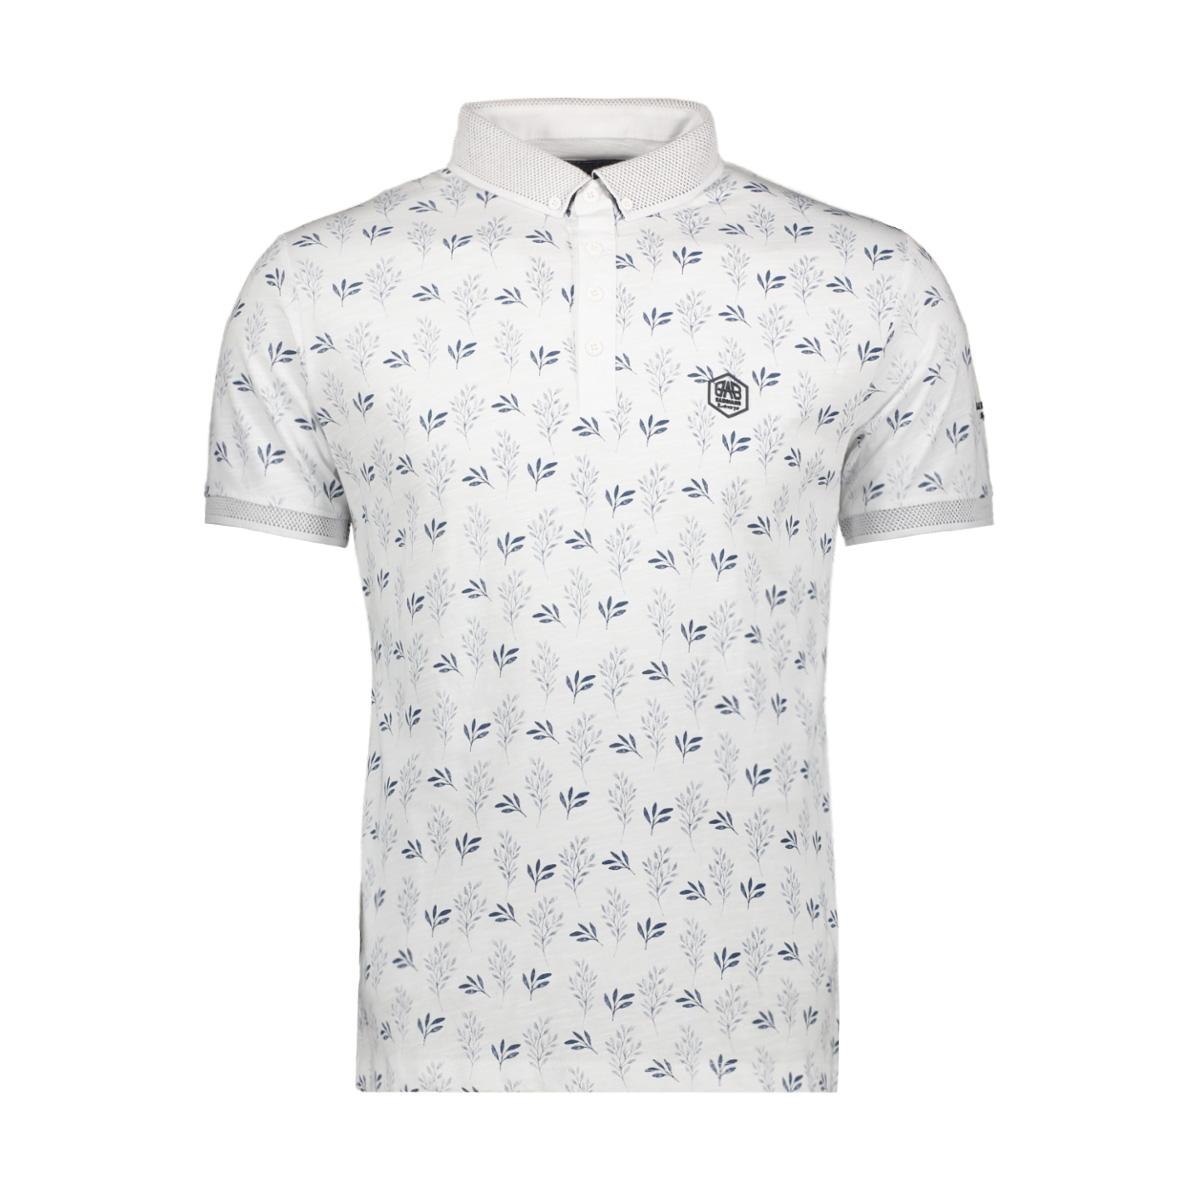 short sleeve polo 22137 gabbiano polo white